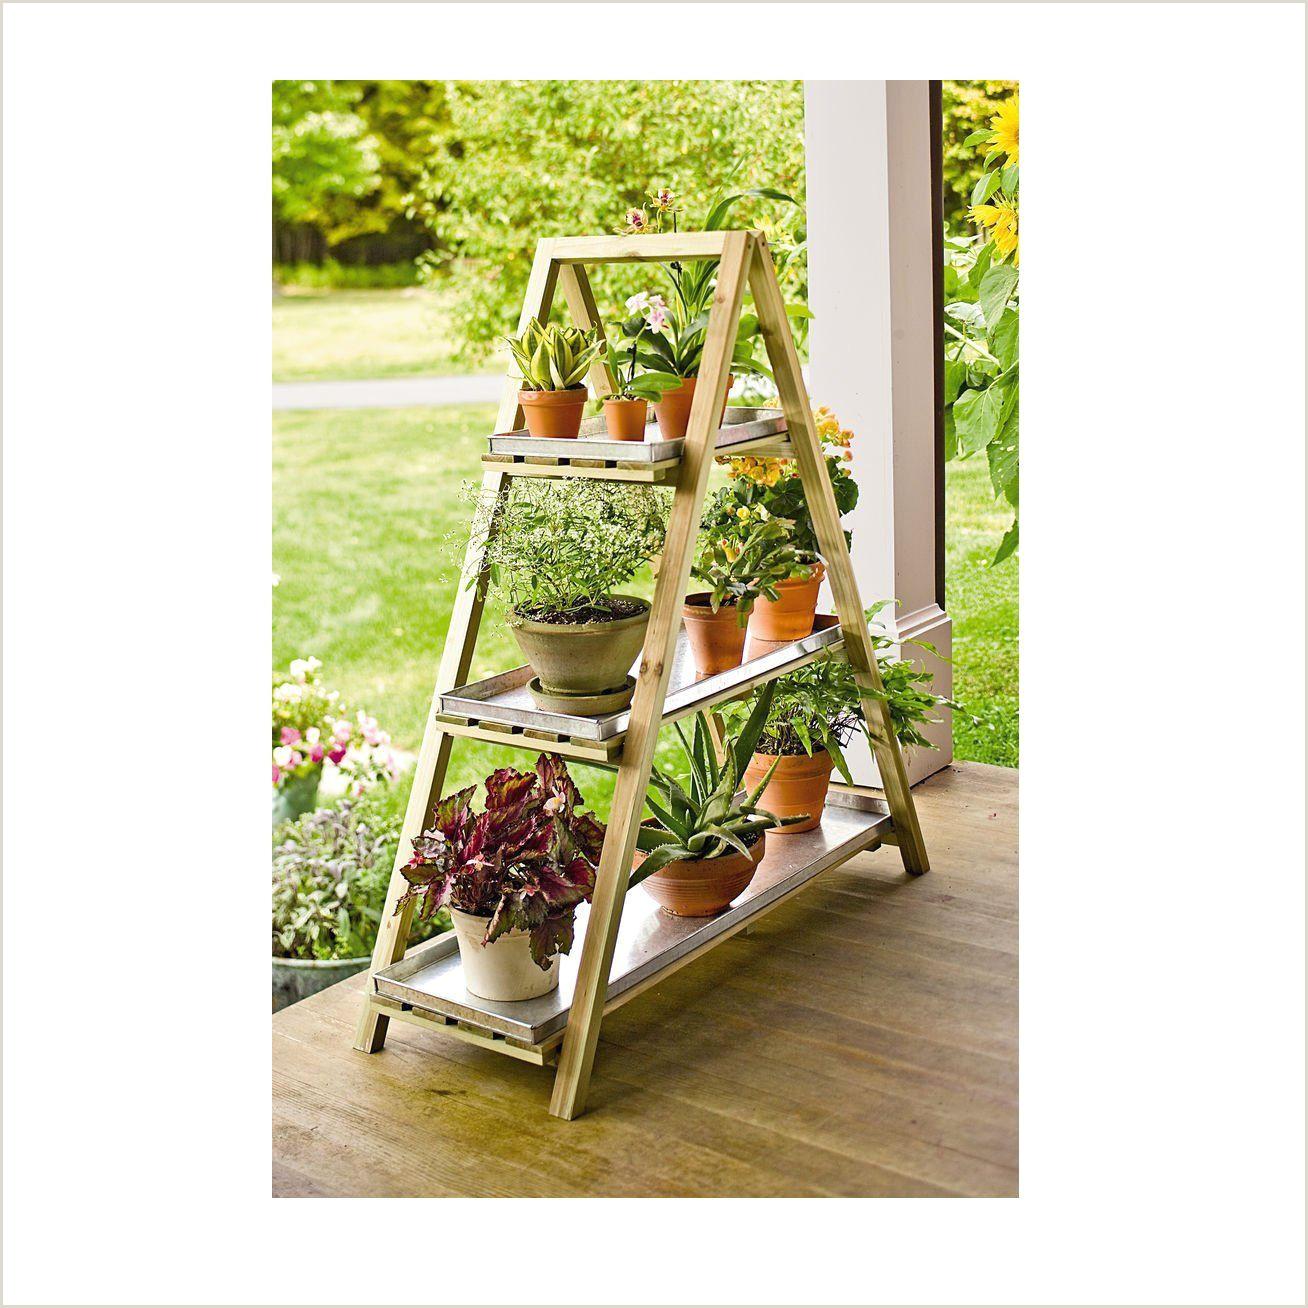 Cheap Picture Stands Sharpex A Frame Solid Wood Garden Planter Shelf Garden Plant